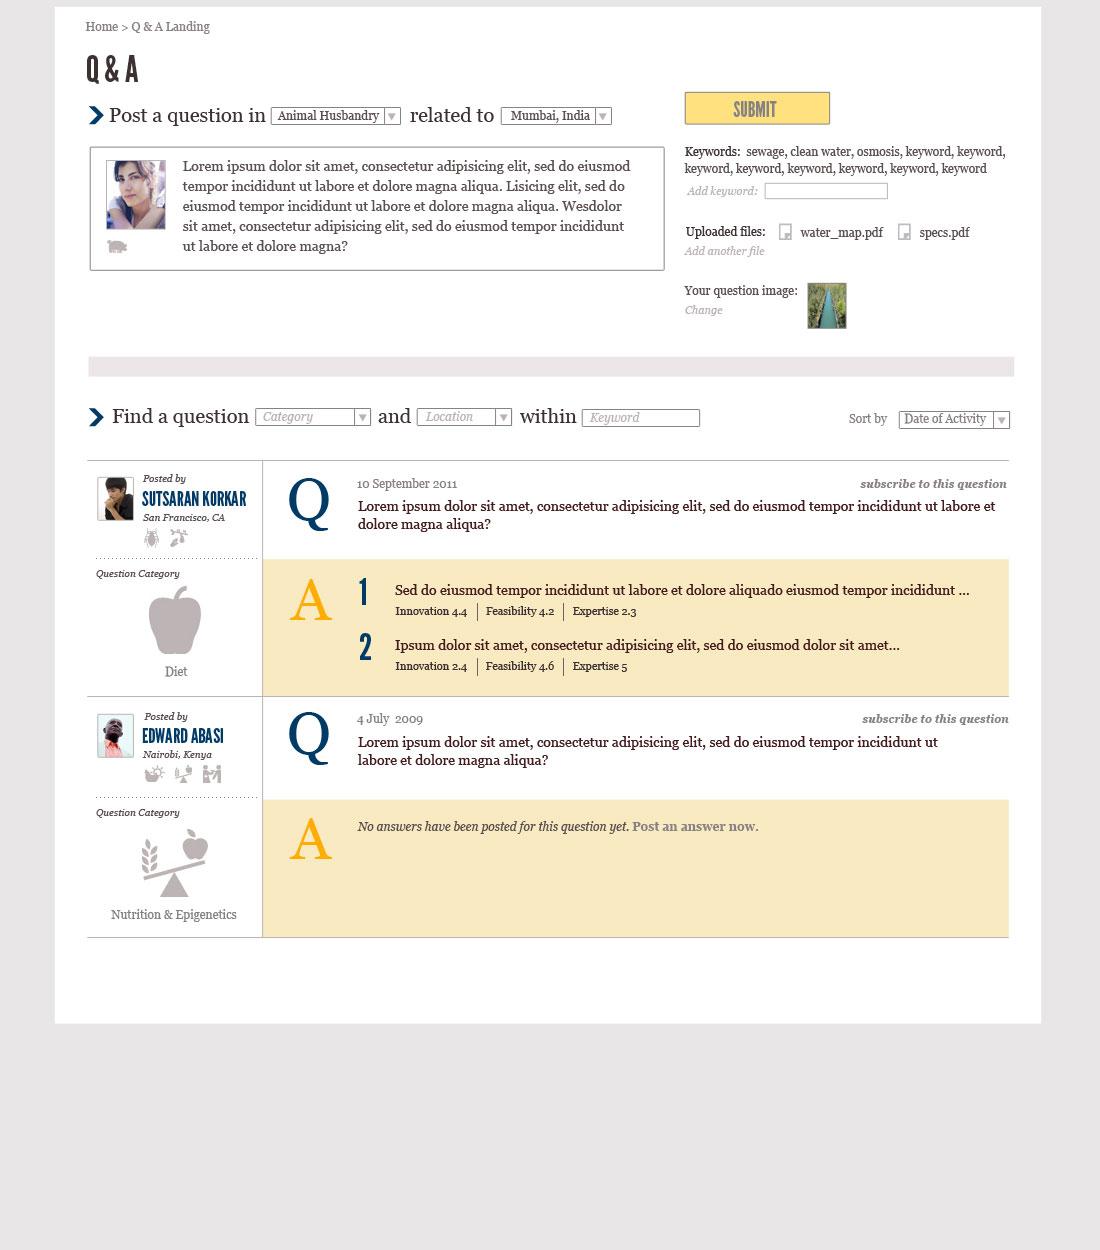 Q&A Landing page